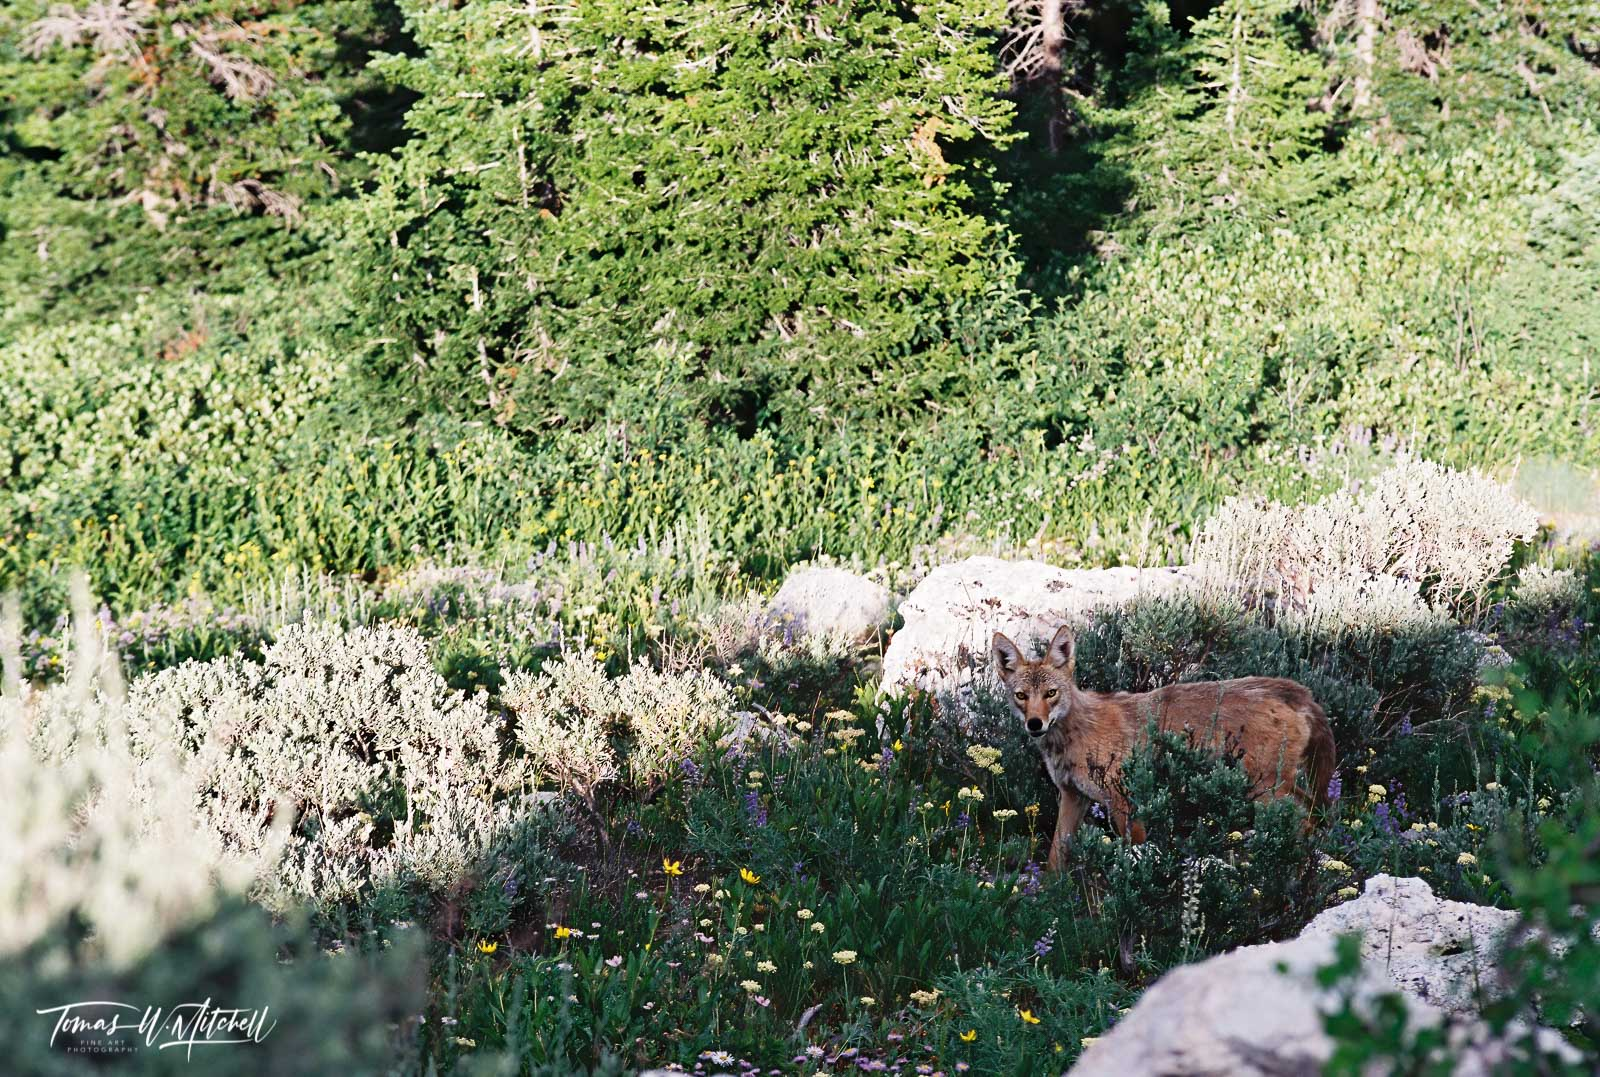 limited edition, fine art, prints, film, photograph, coyote, wasatch mountains, utah, wildlife, nikon, dog, wildlife, , photo